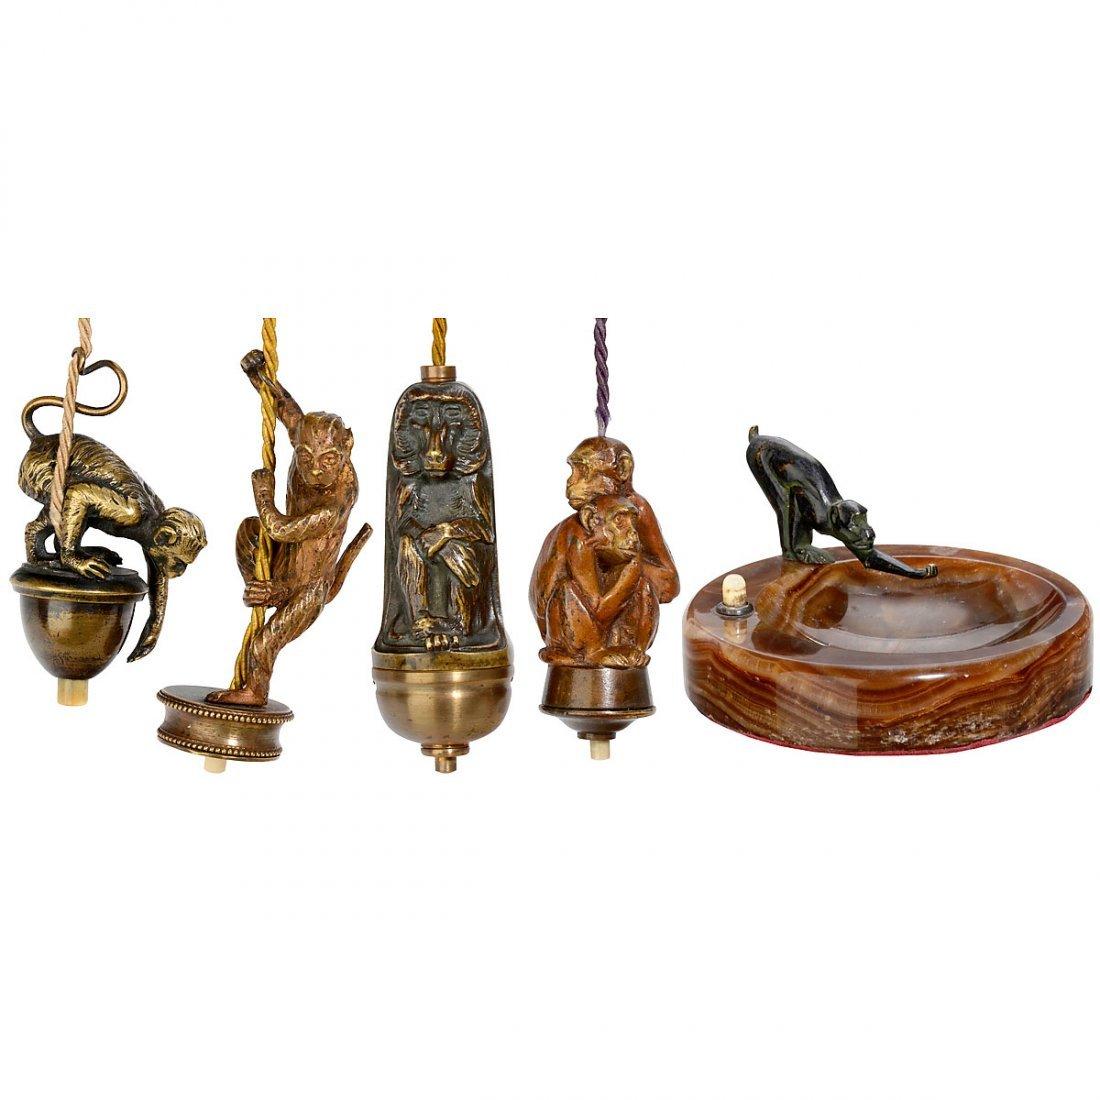 5 Electrical Table Bells Depicting Monkeys, c. 1910